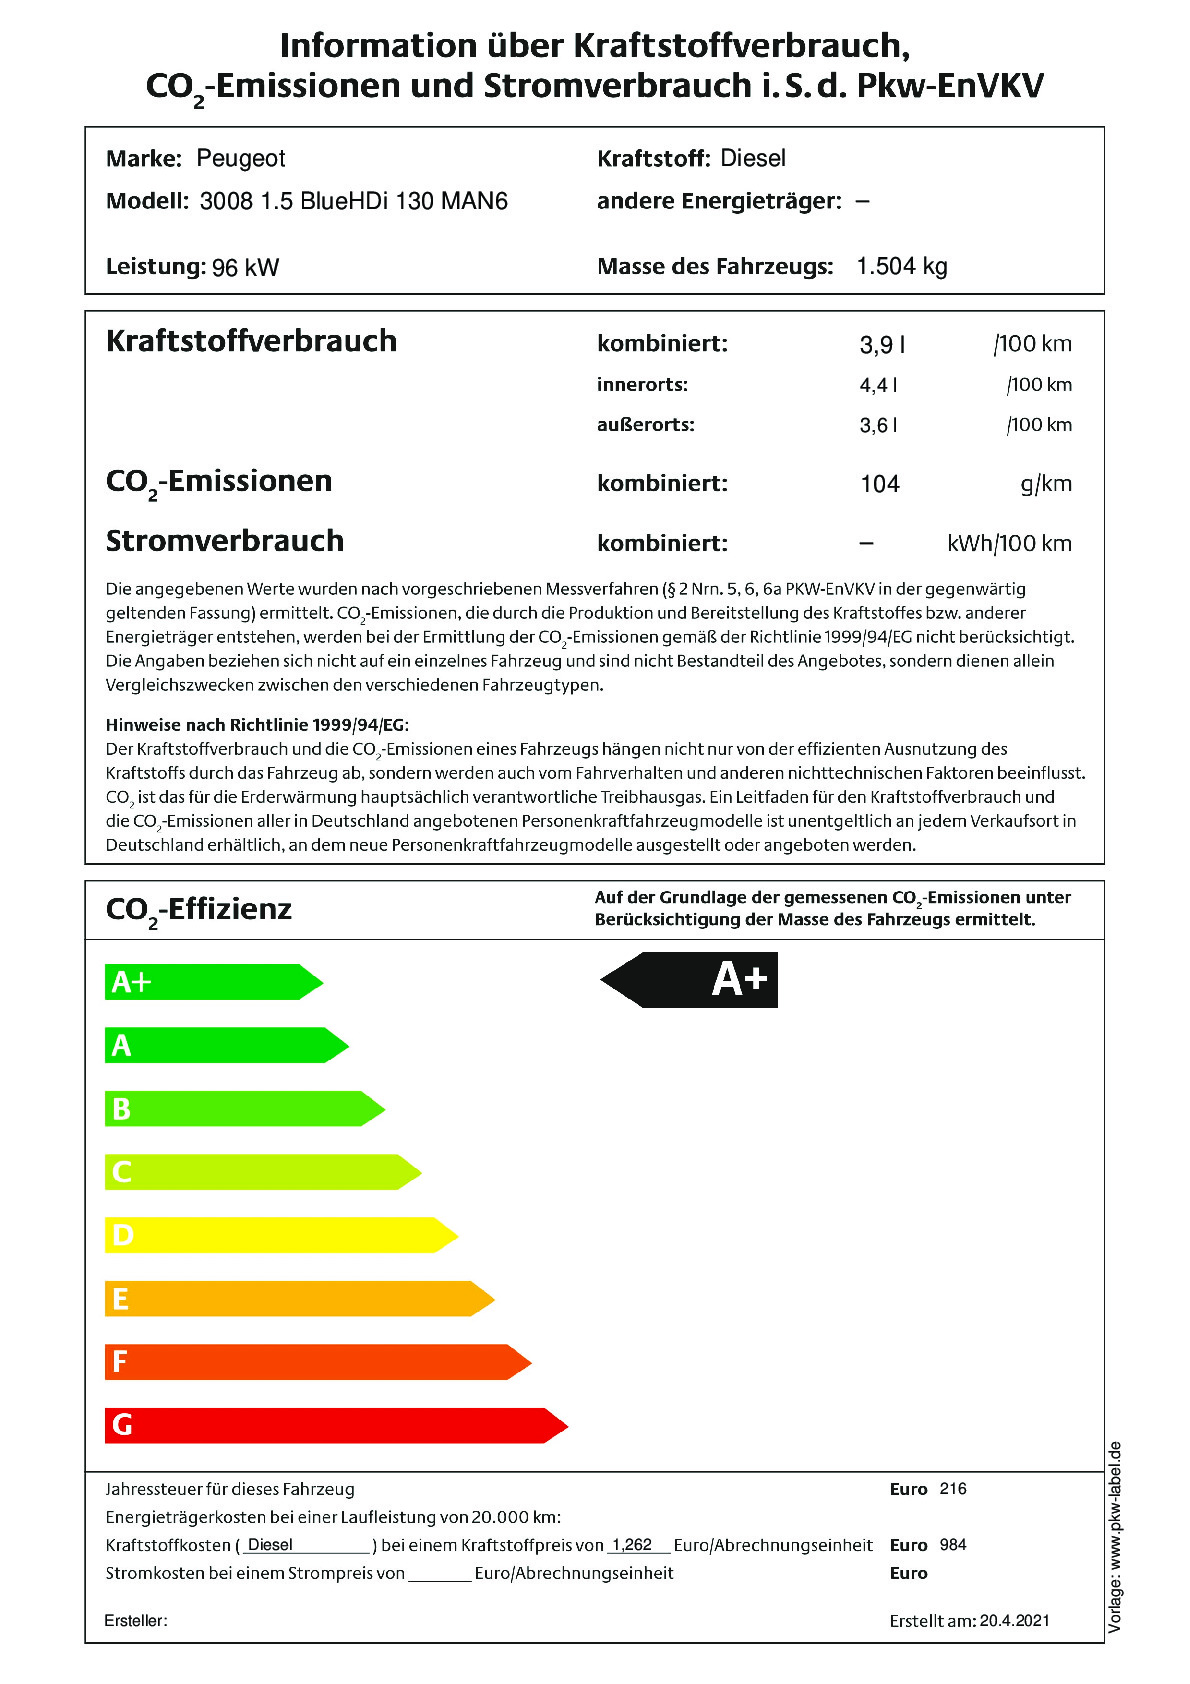 Energielabel 1.5 BlueHDI 130 S&S MAN6